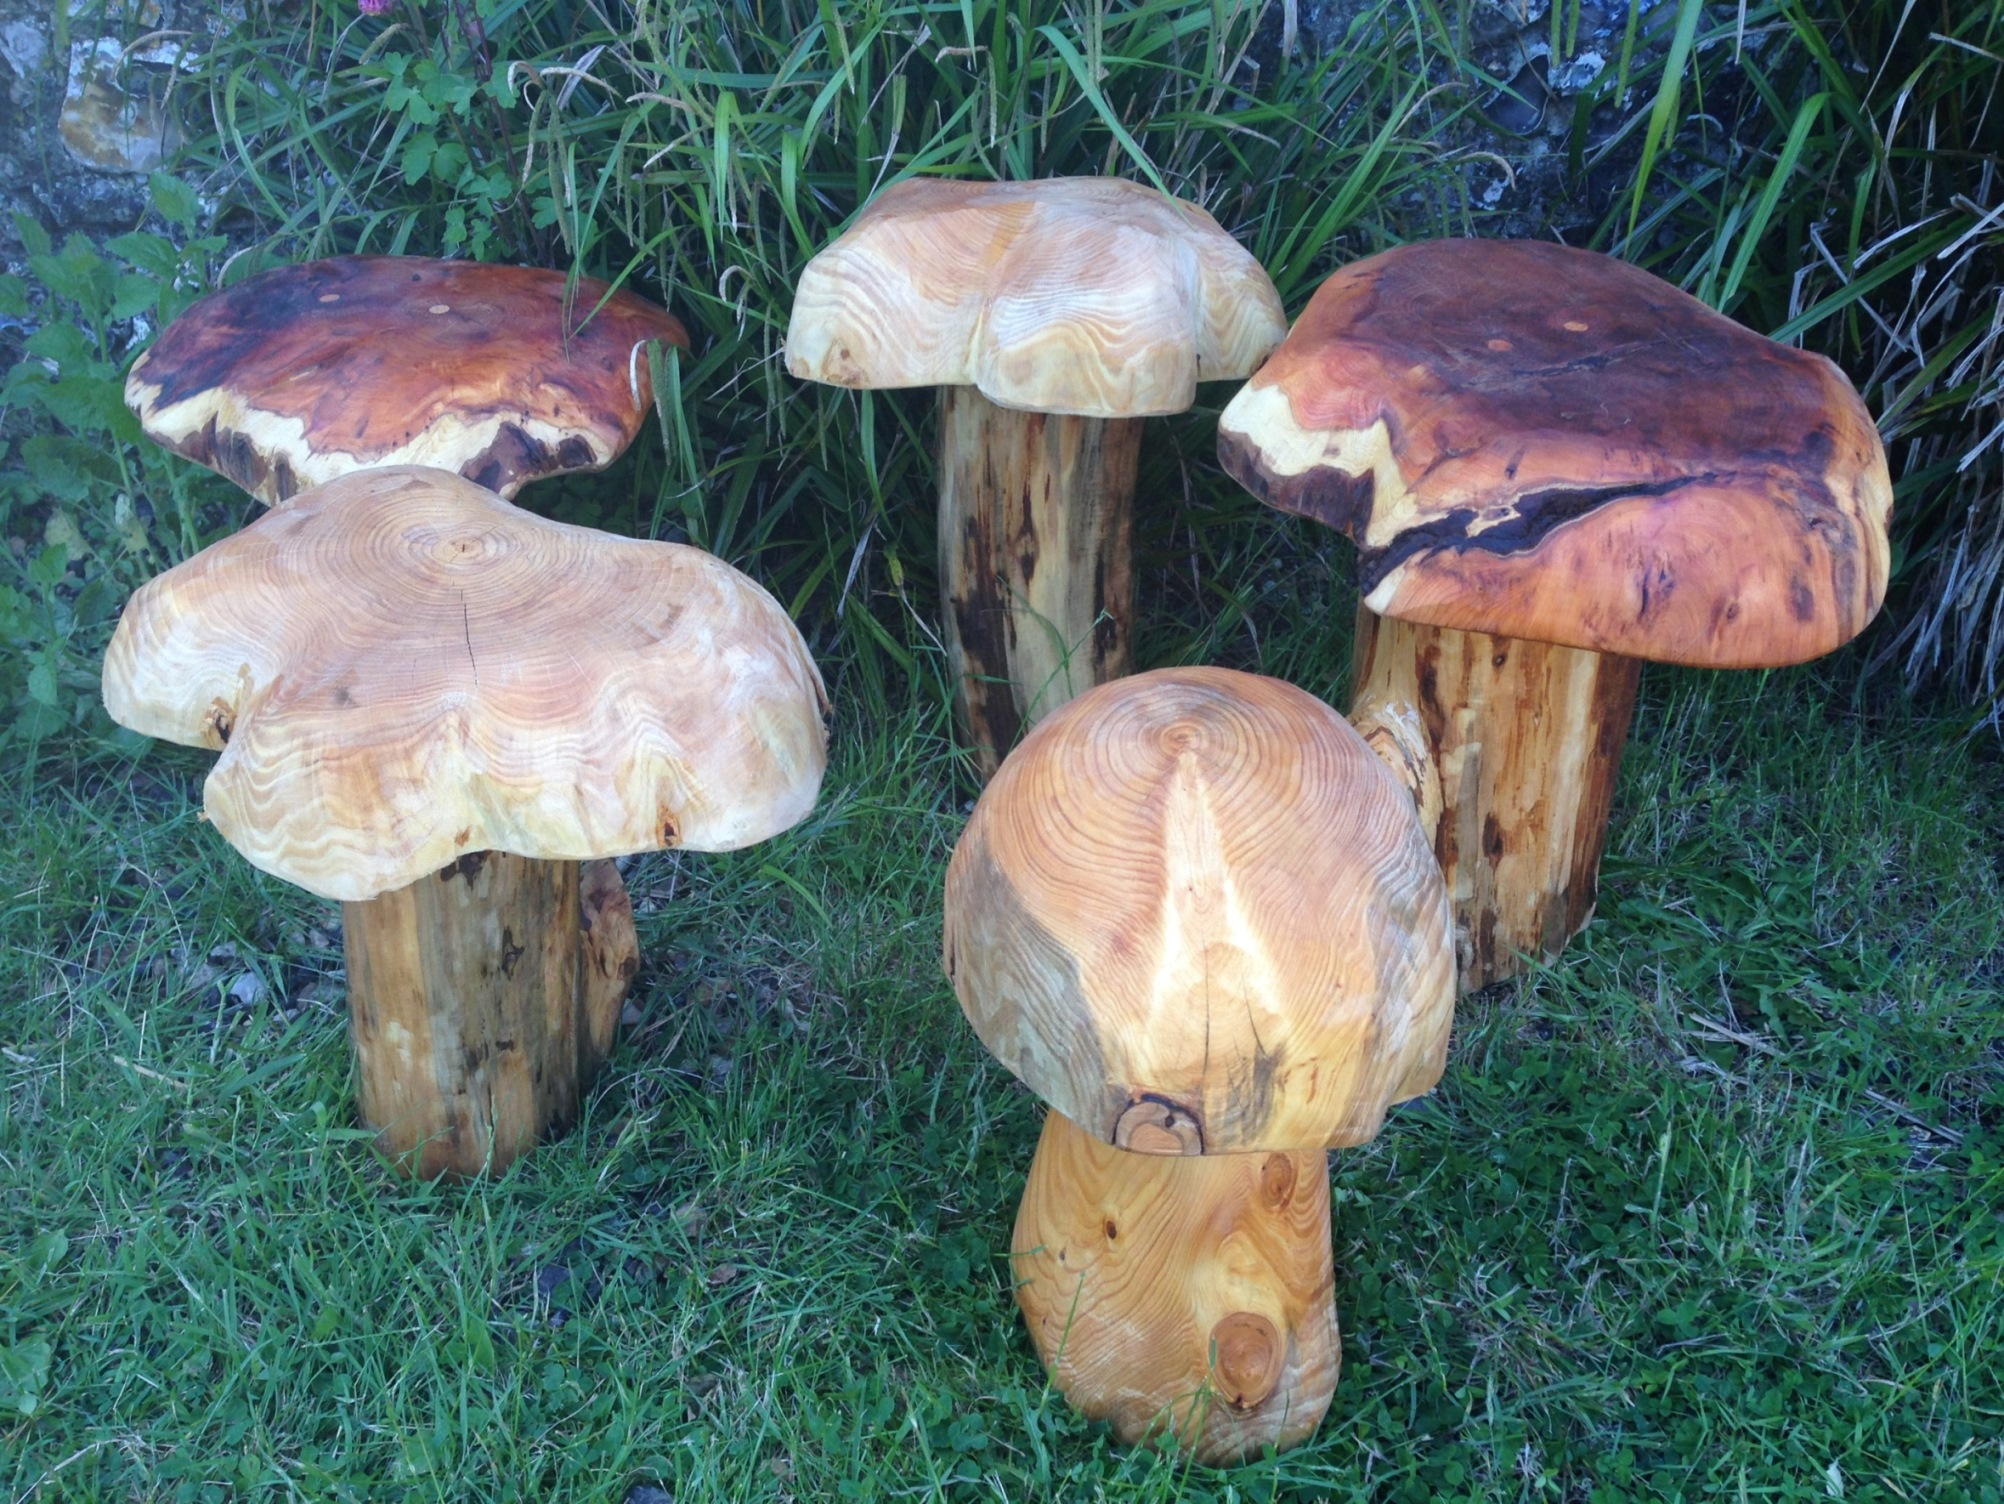 20150605 Mushrooms (1).JPG